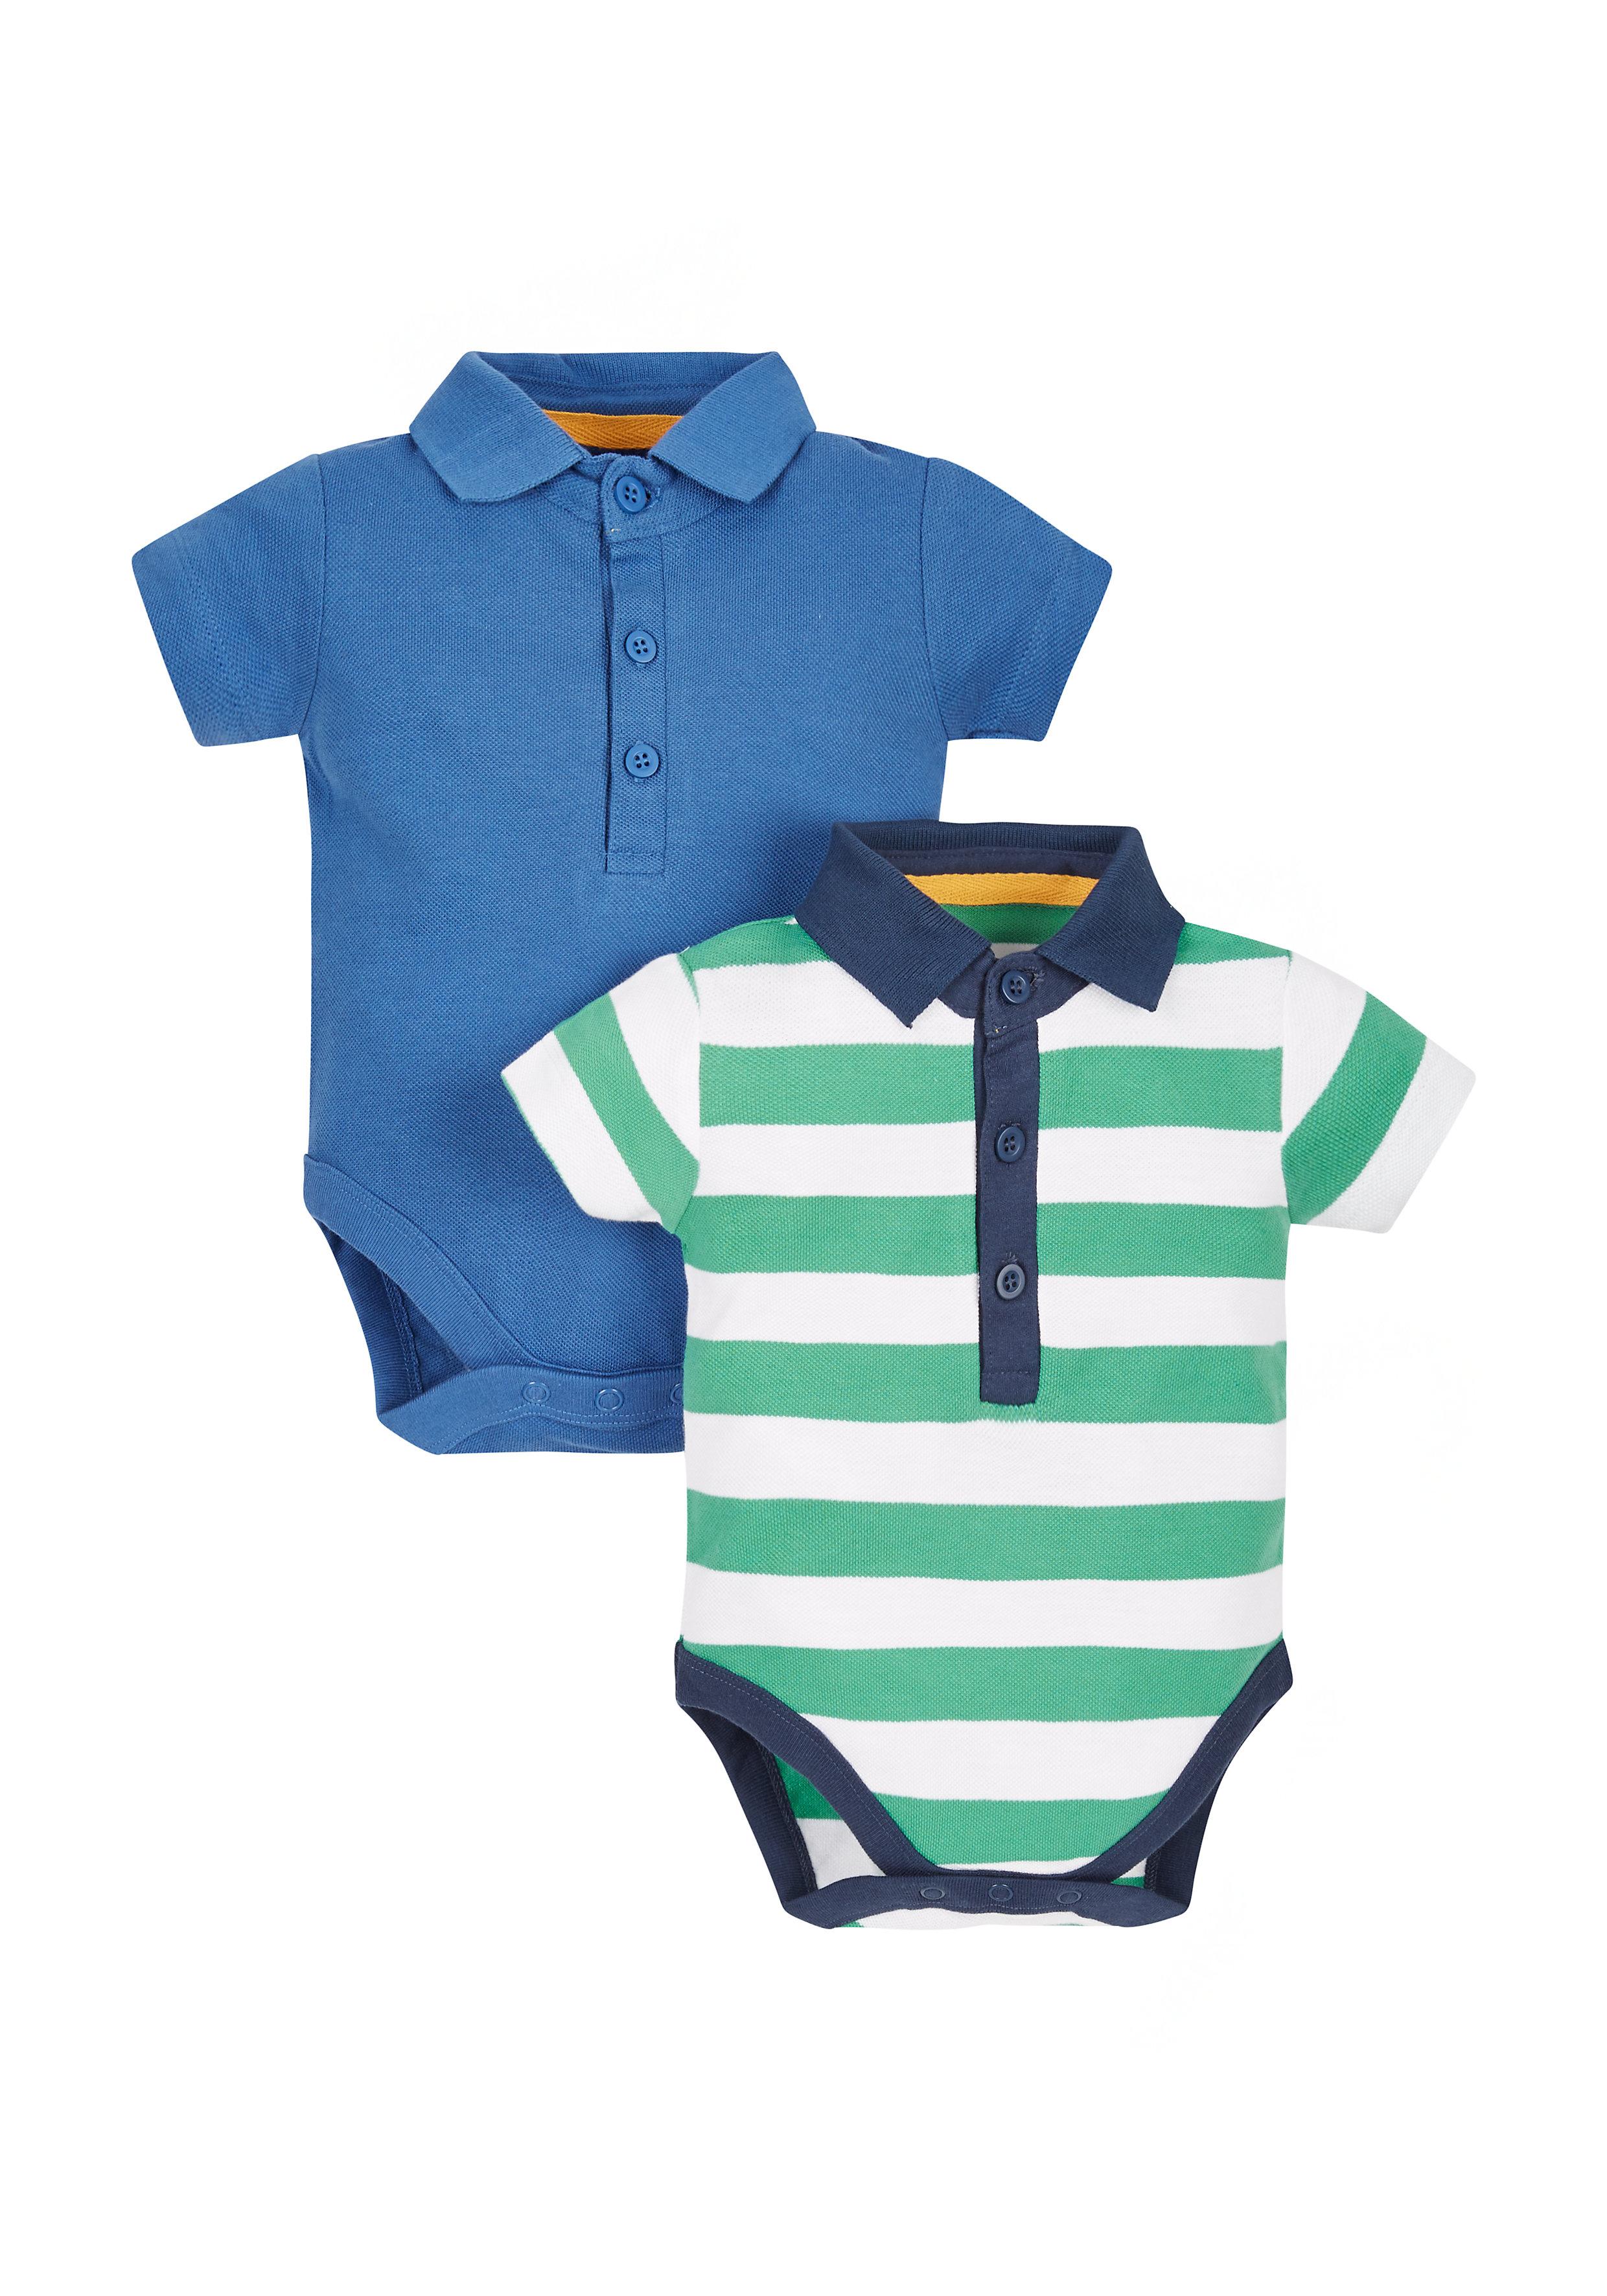 Mothercare | Boys Pique Polo Bodysuits - Pack Of 2 - Multicolor